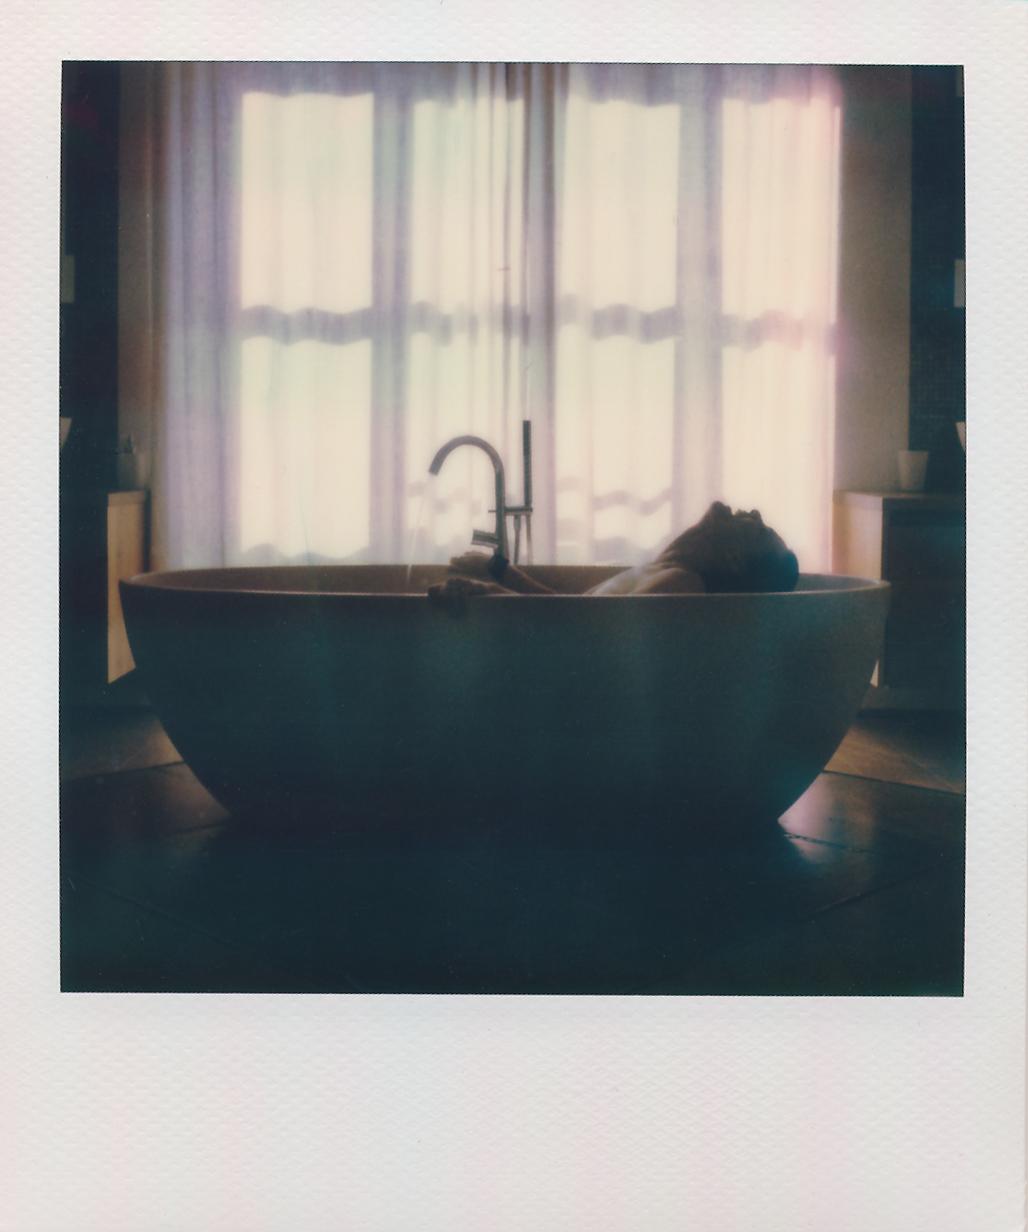 Deb_Polaroid3.jpg